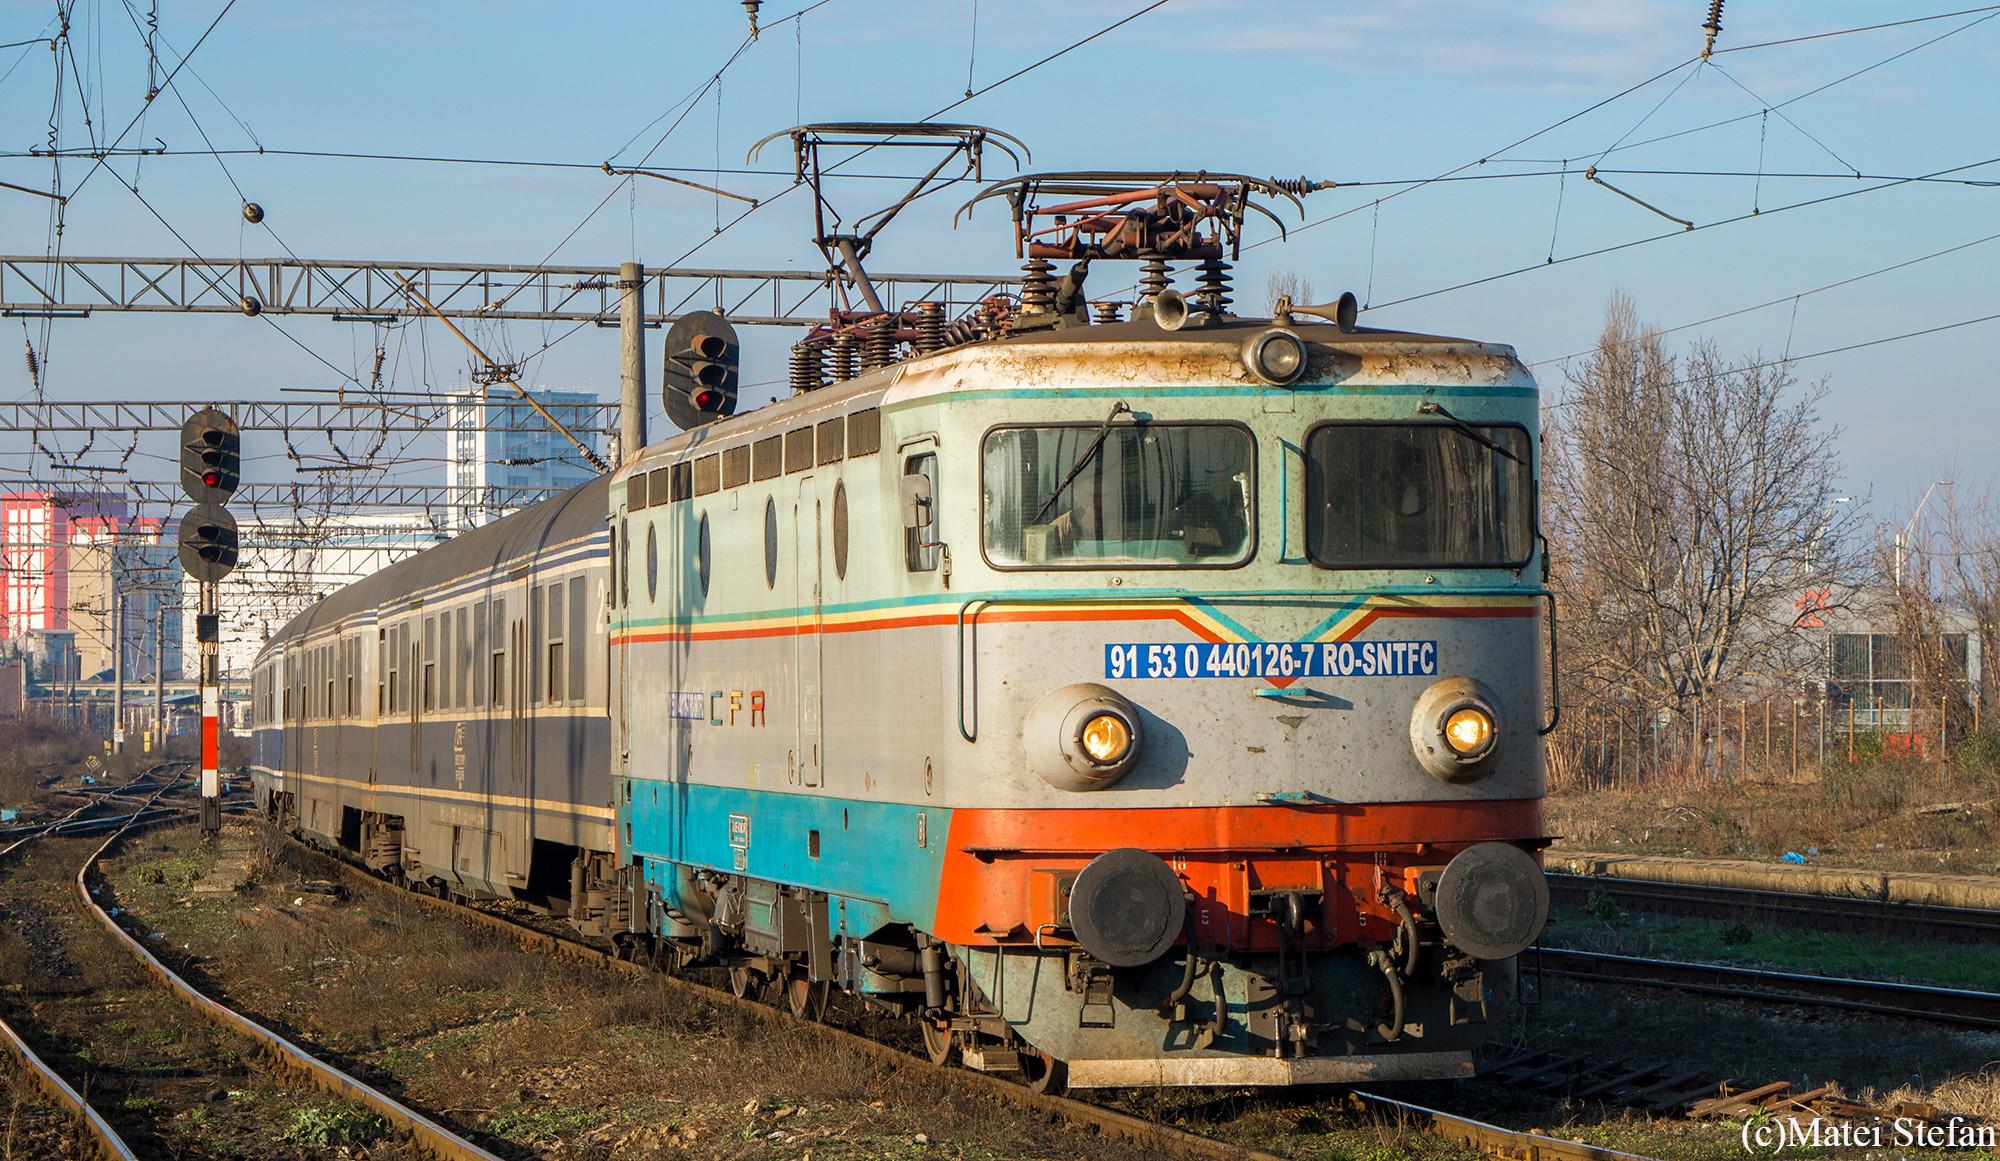 EC1 44 0126-7: CFR Călători